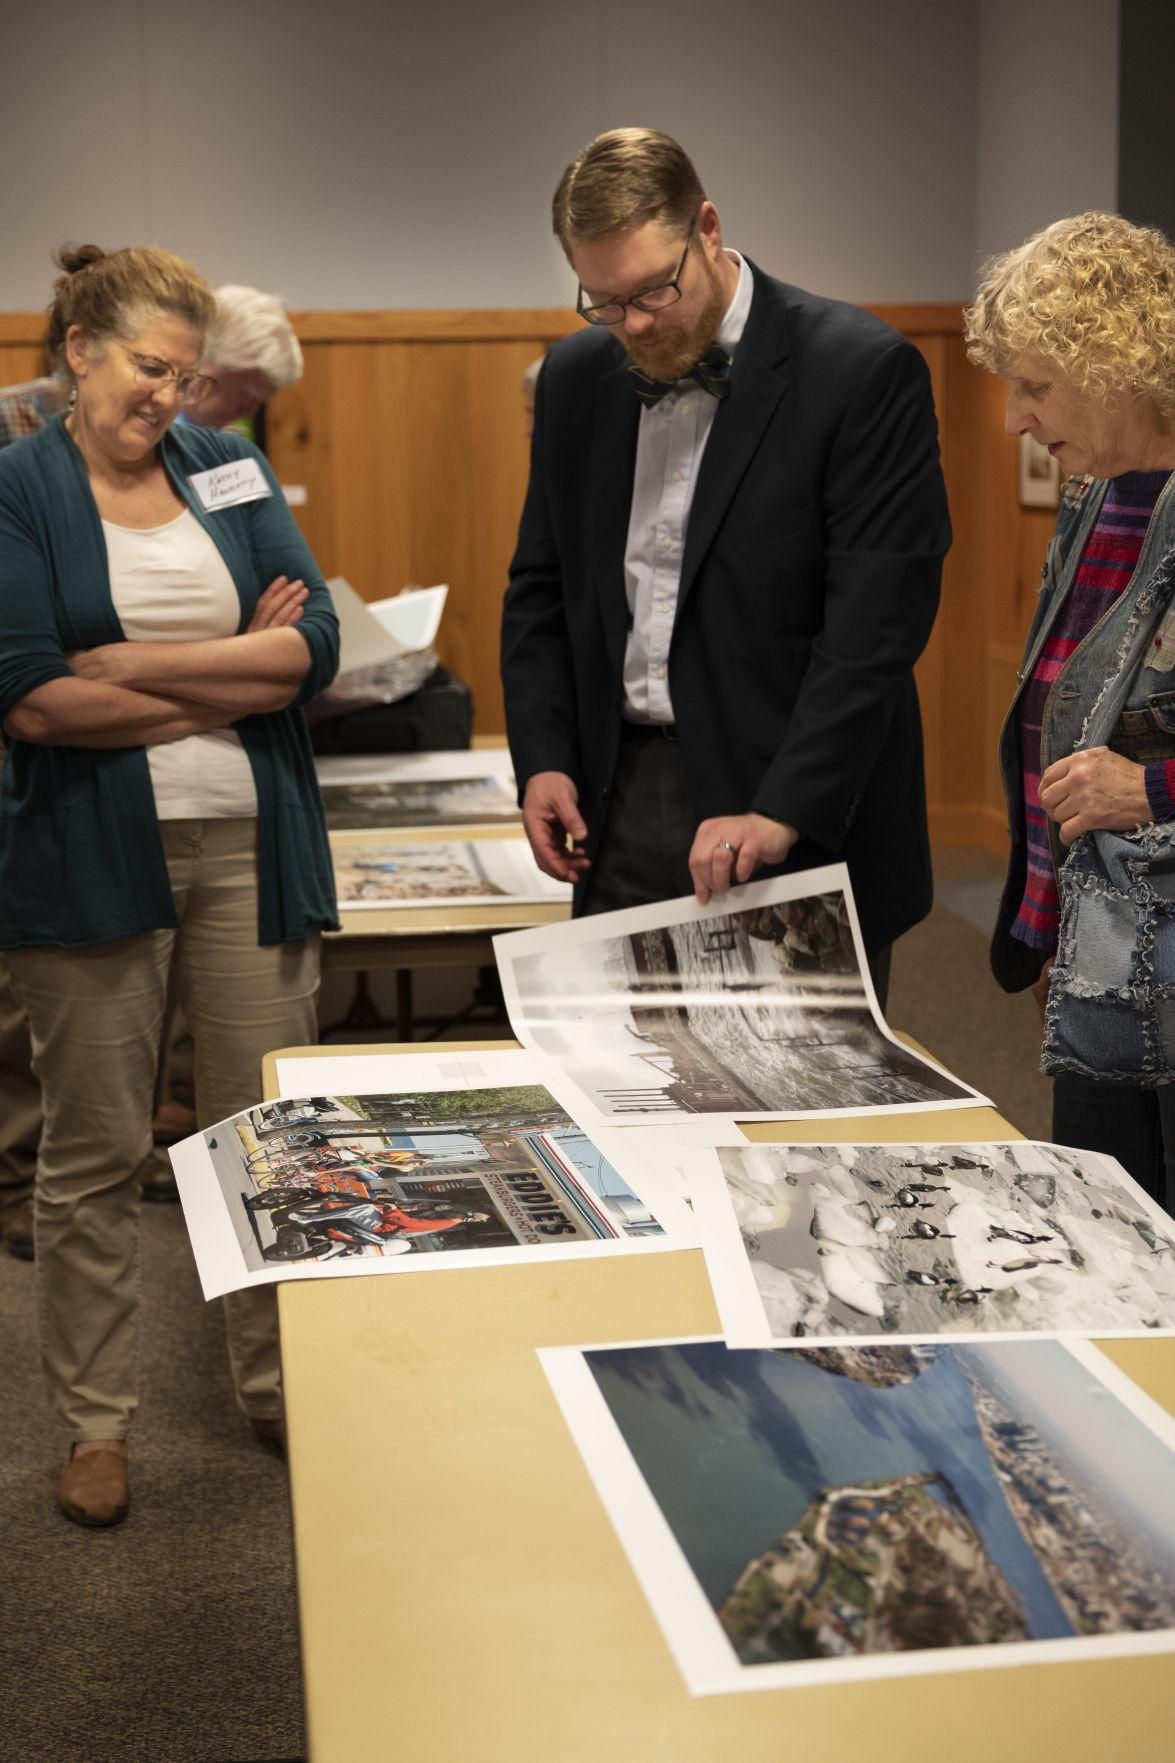 Linda Butler presents photographs